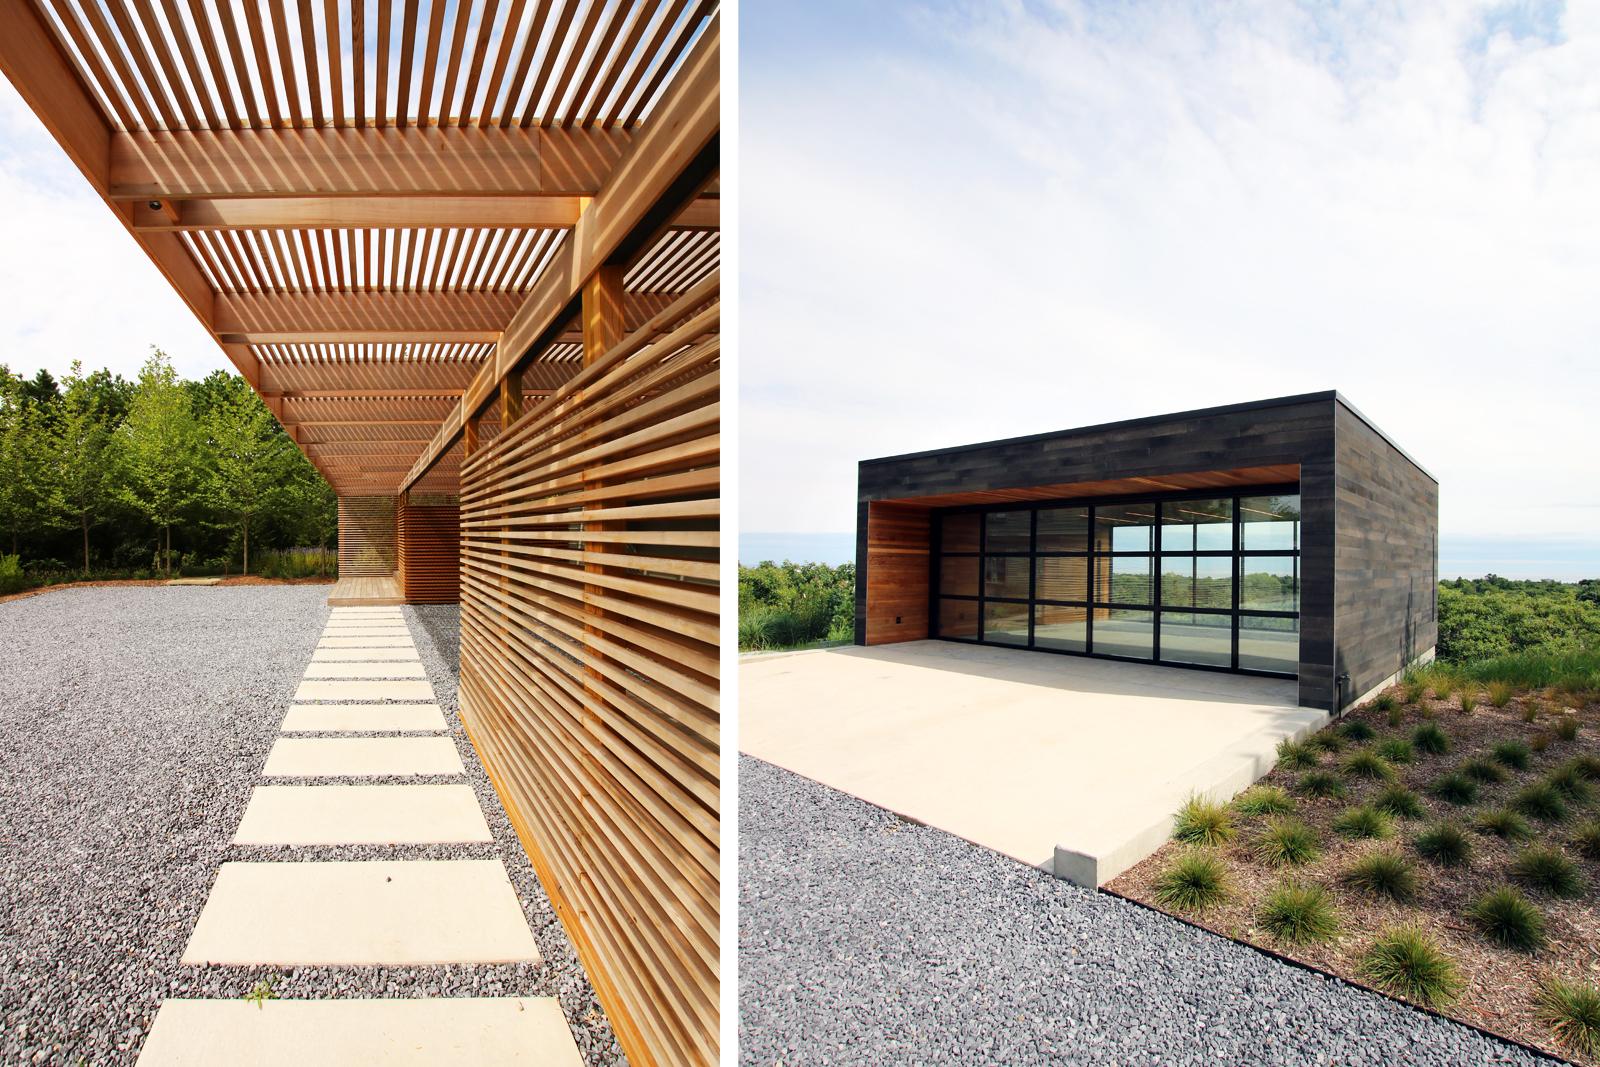 res4-resolution-4-architecture-modern-modular-house-prefab-amagansett-addition-enetry-path-garage.jpg